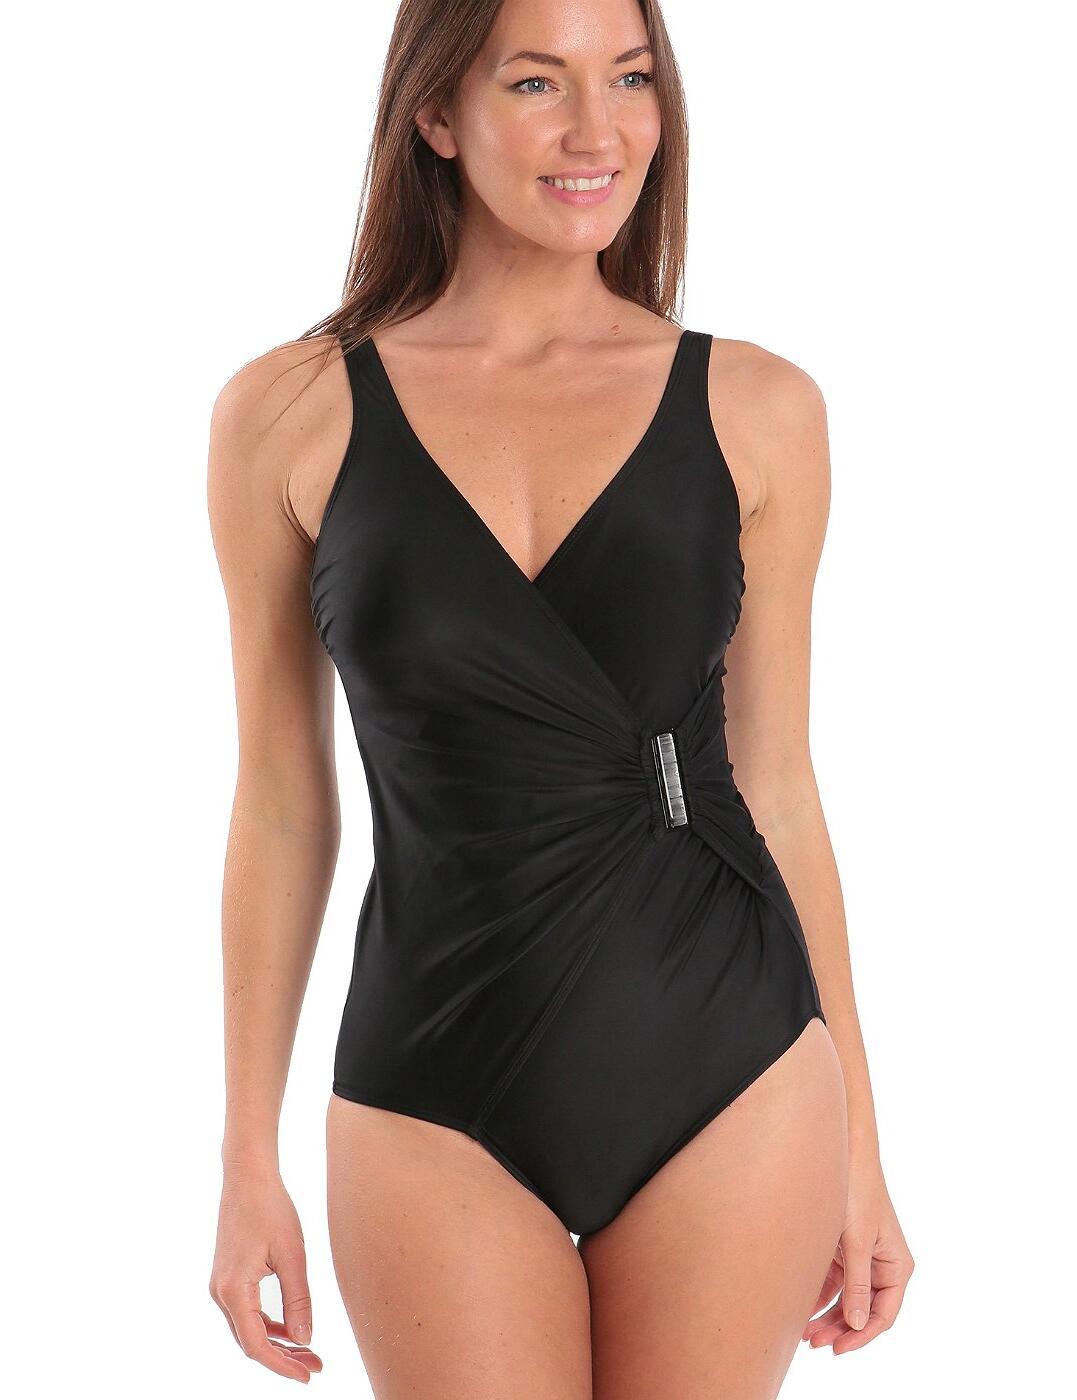 12-2112A Seaspray Manhattan Side Buckles Swimsuit - 12-2112A Black